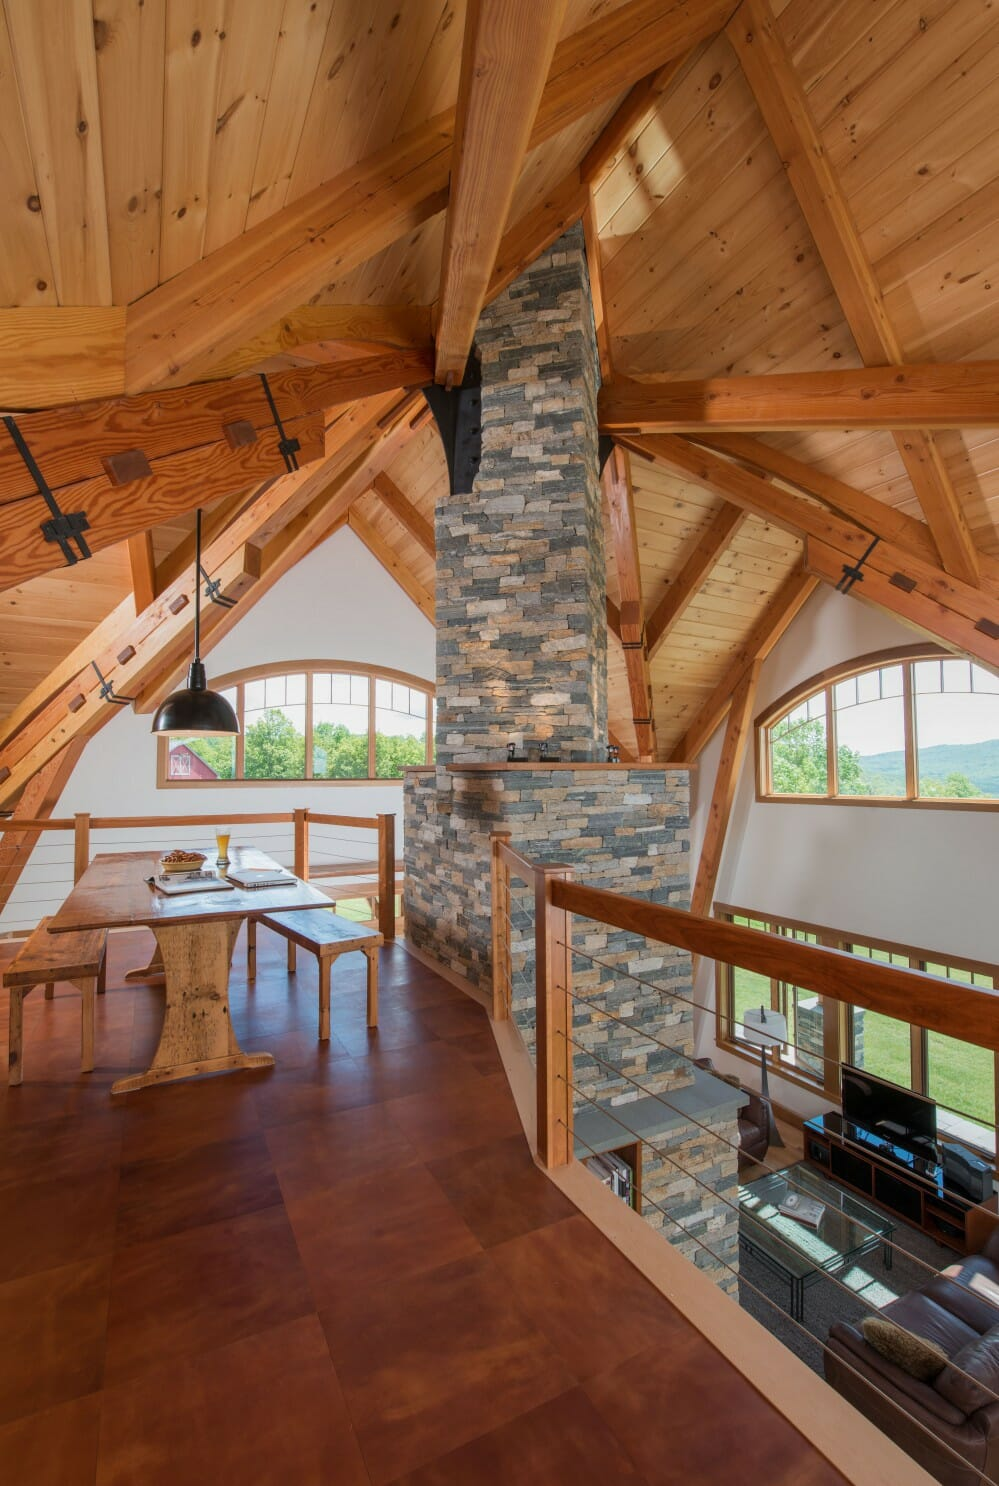 homes-night-pasture-farm-stone-chimney-ceiling-beams